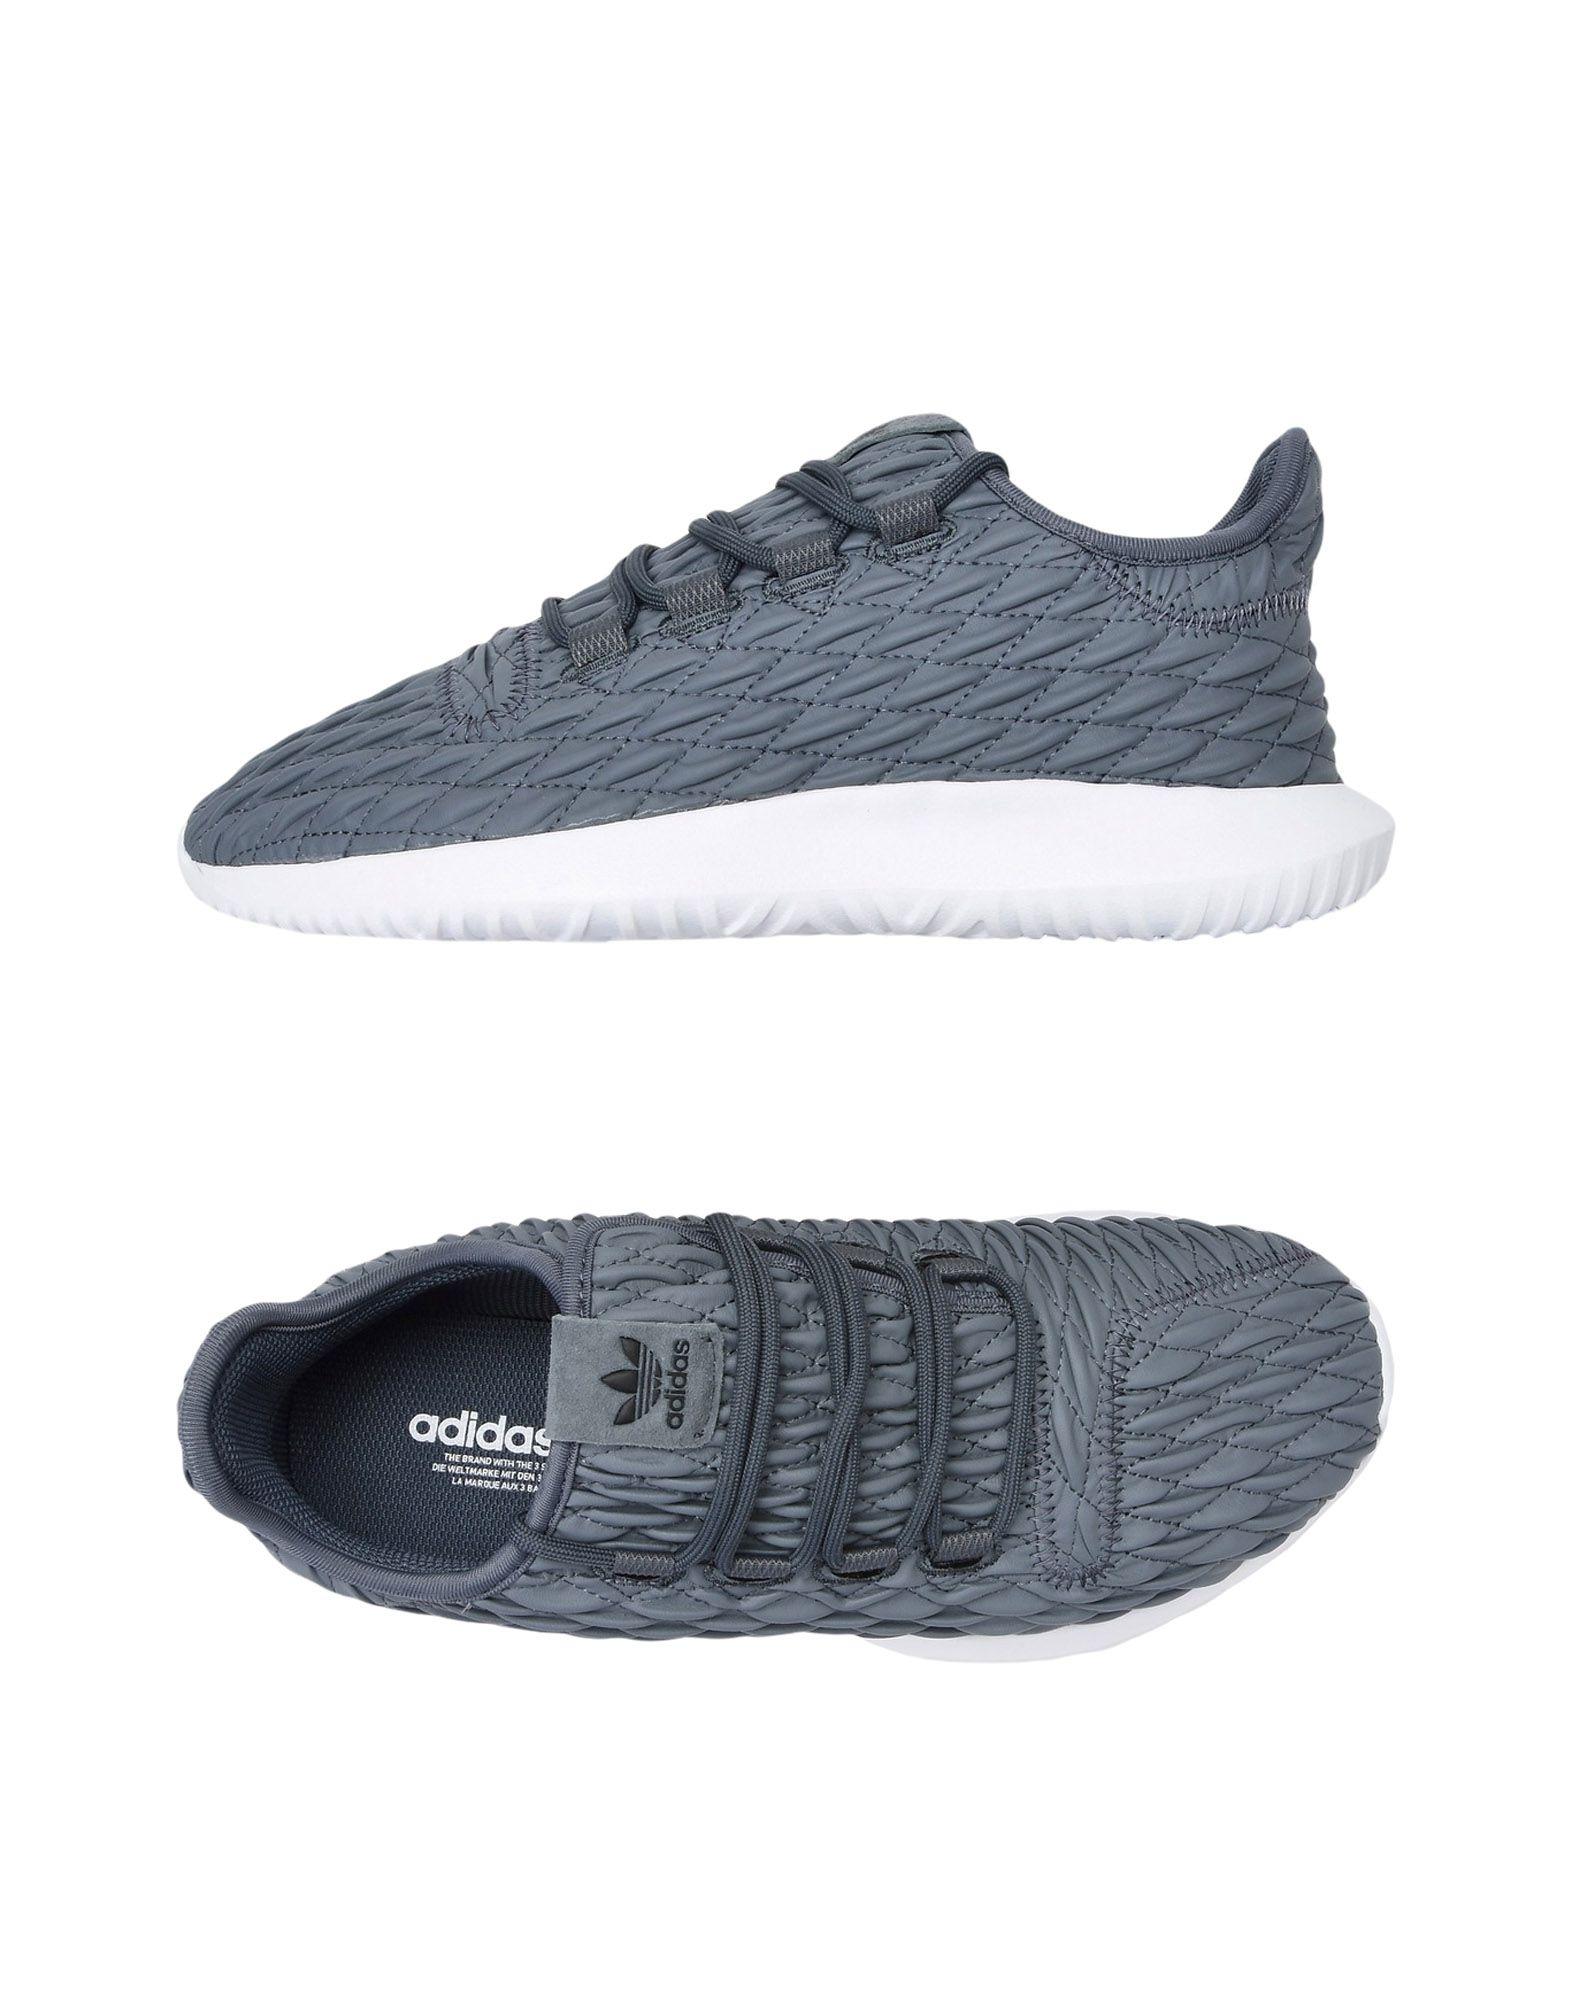 Sneakers Adidas Originals Tubular Shadow W - Donna - 11262594WC